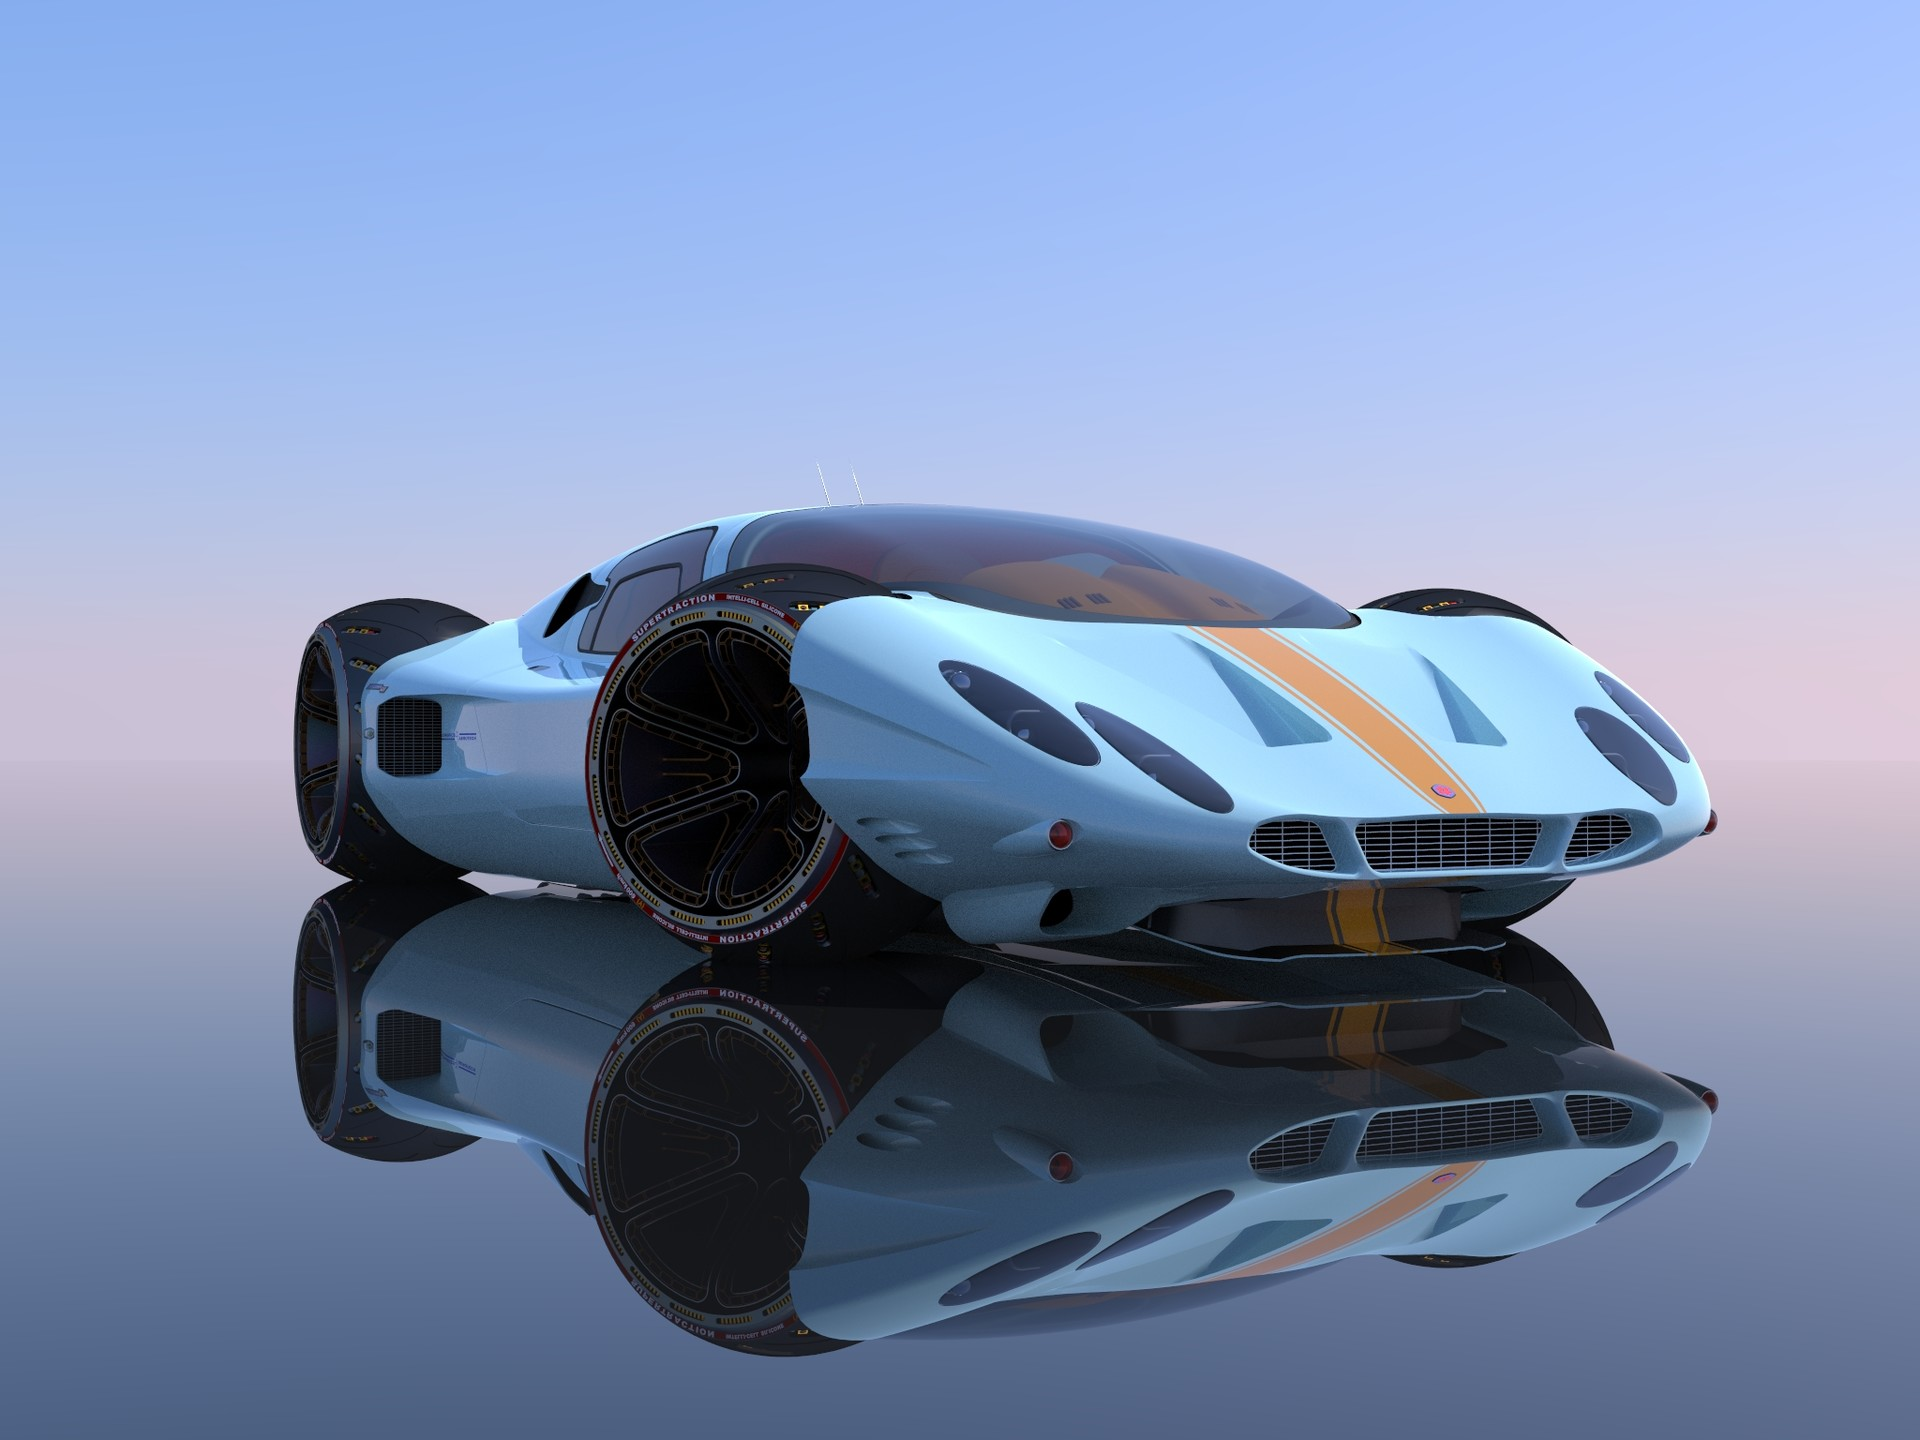 Joachim sverd supercar concept34